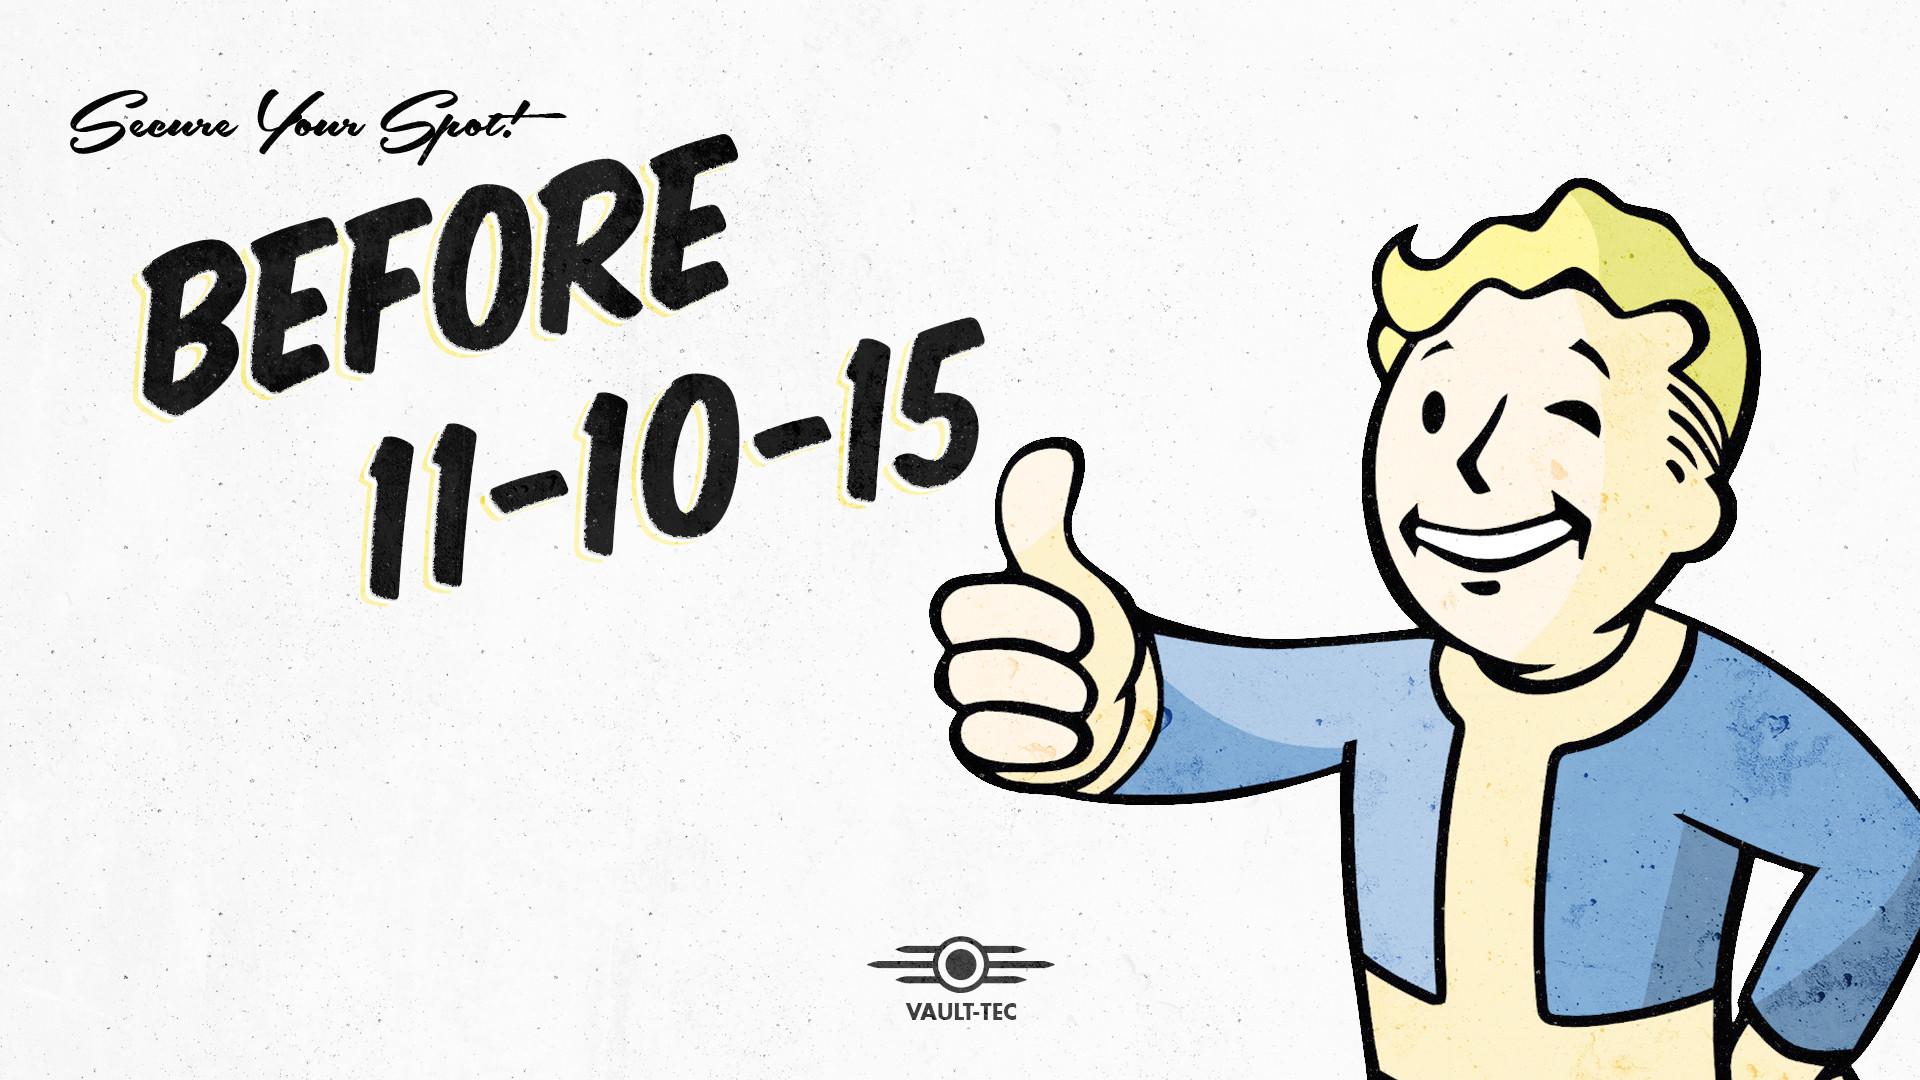 I made a Vault-Tec approved Fallout 4 Wallpaper!